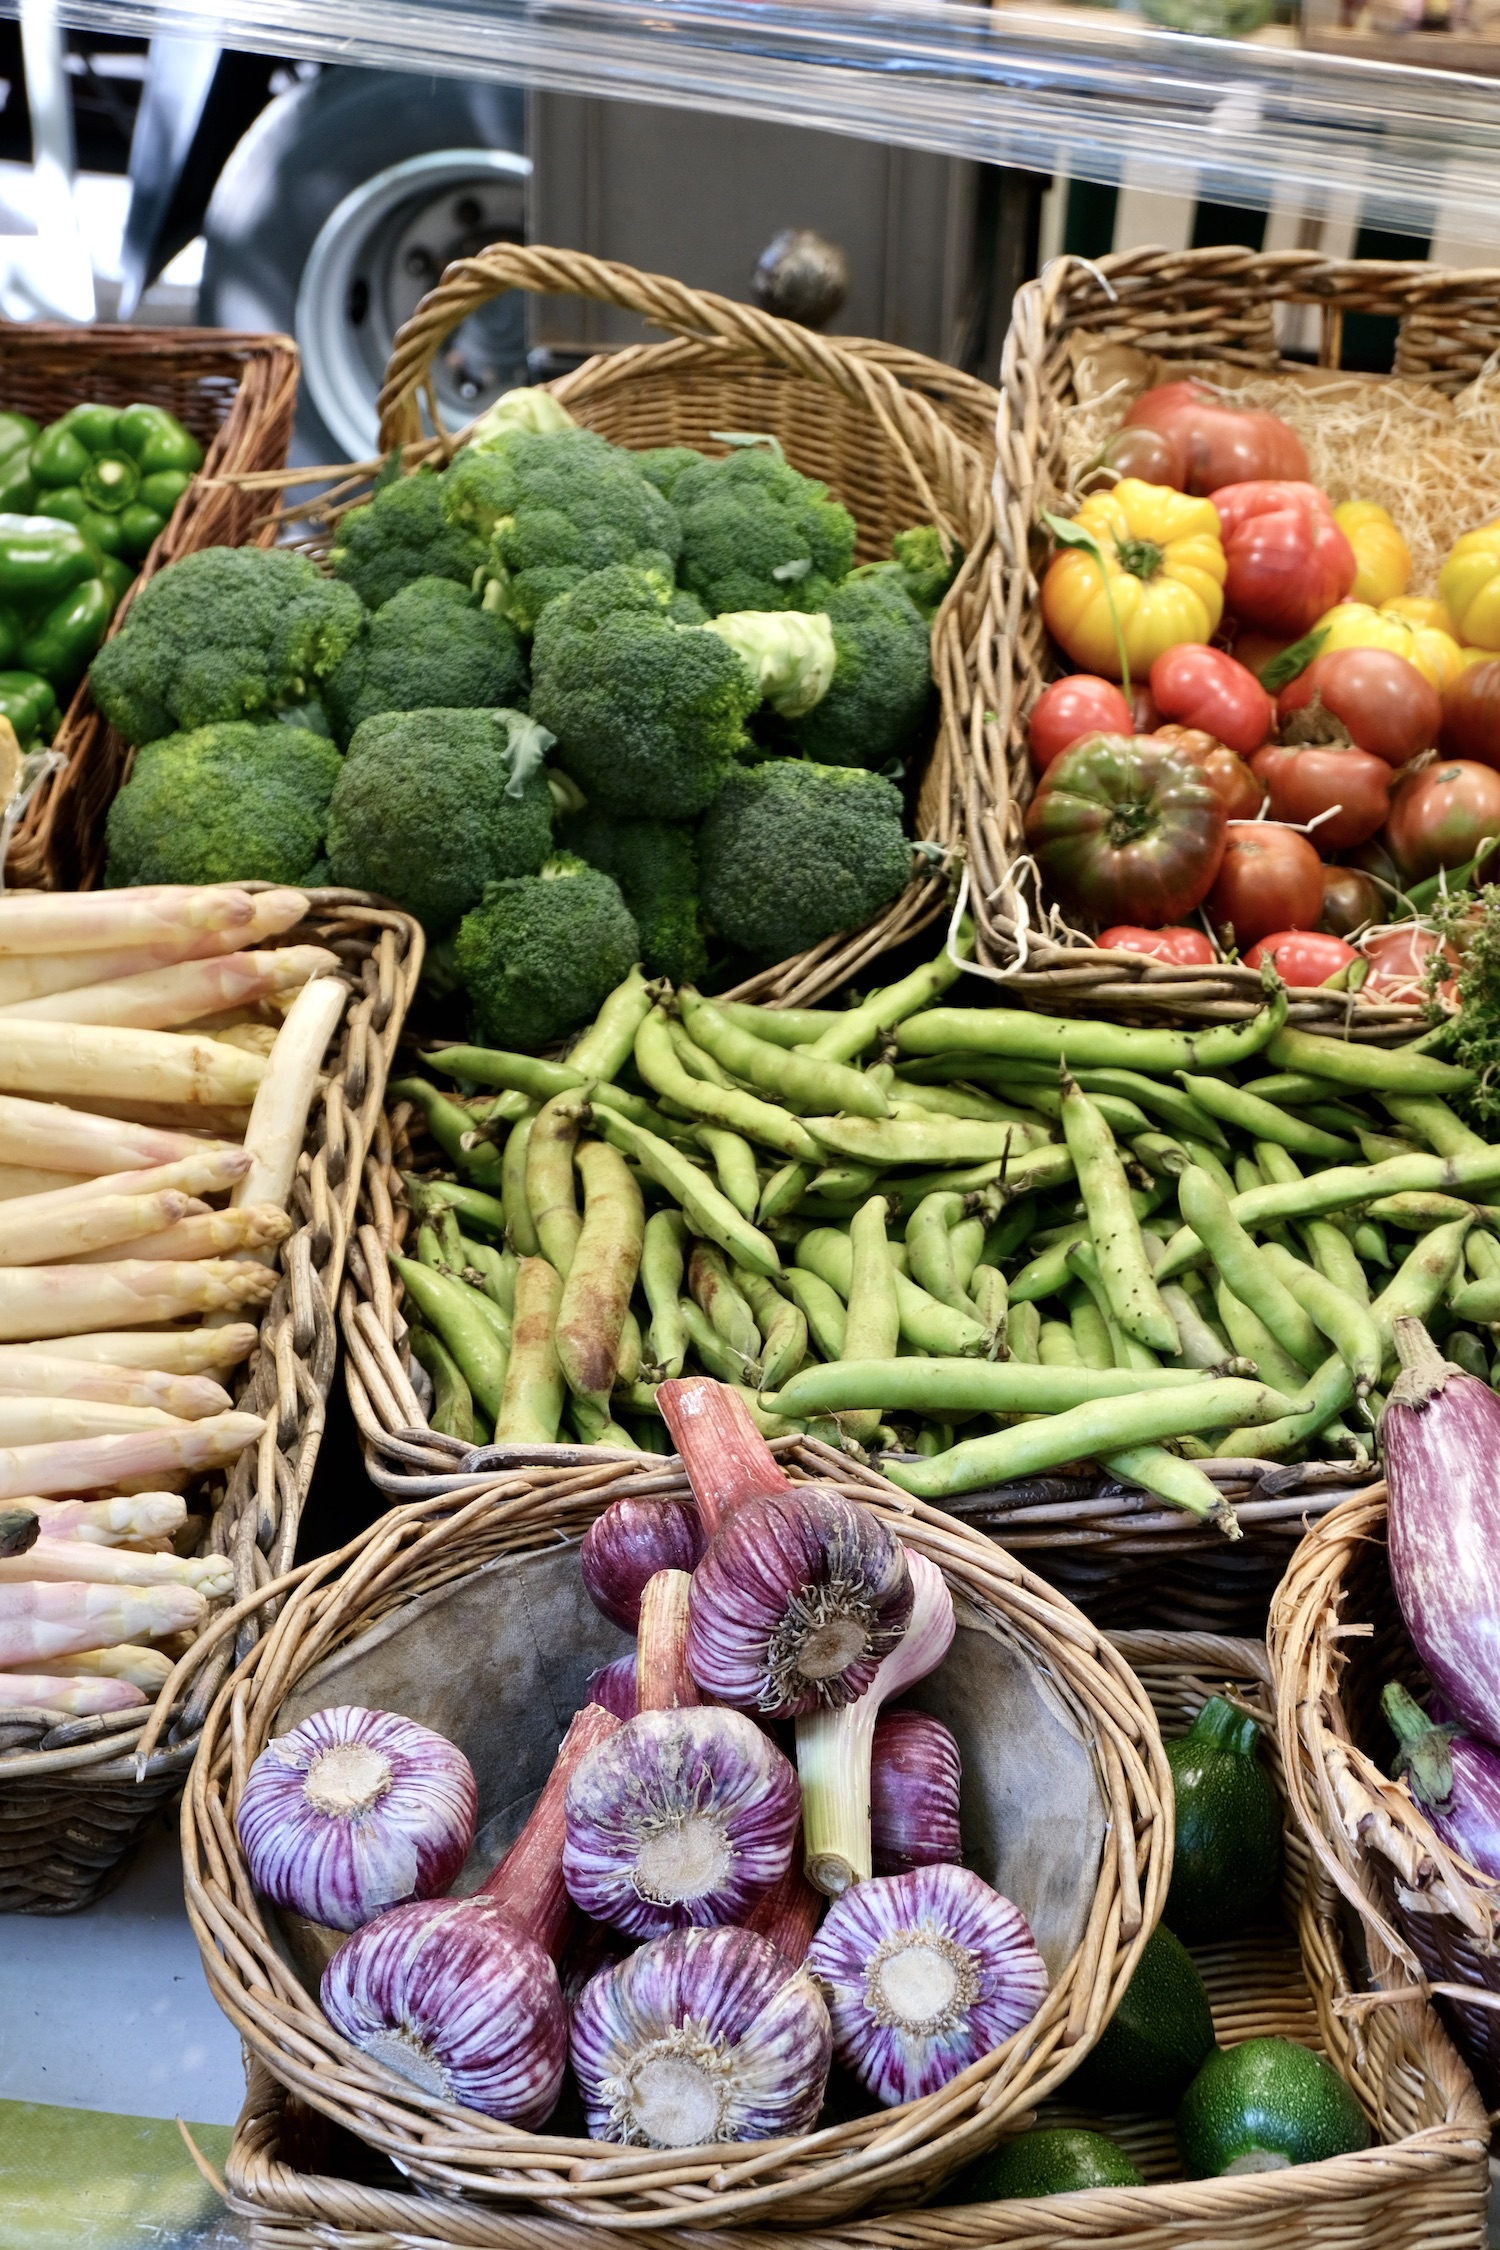 Marche Raspail produce